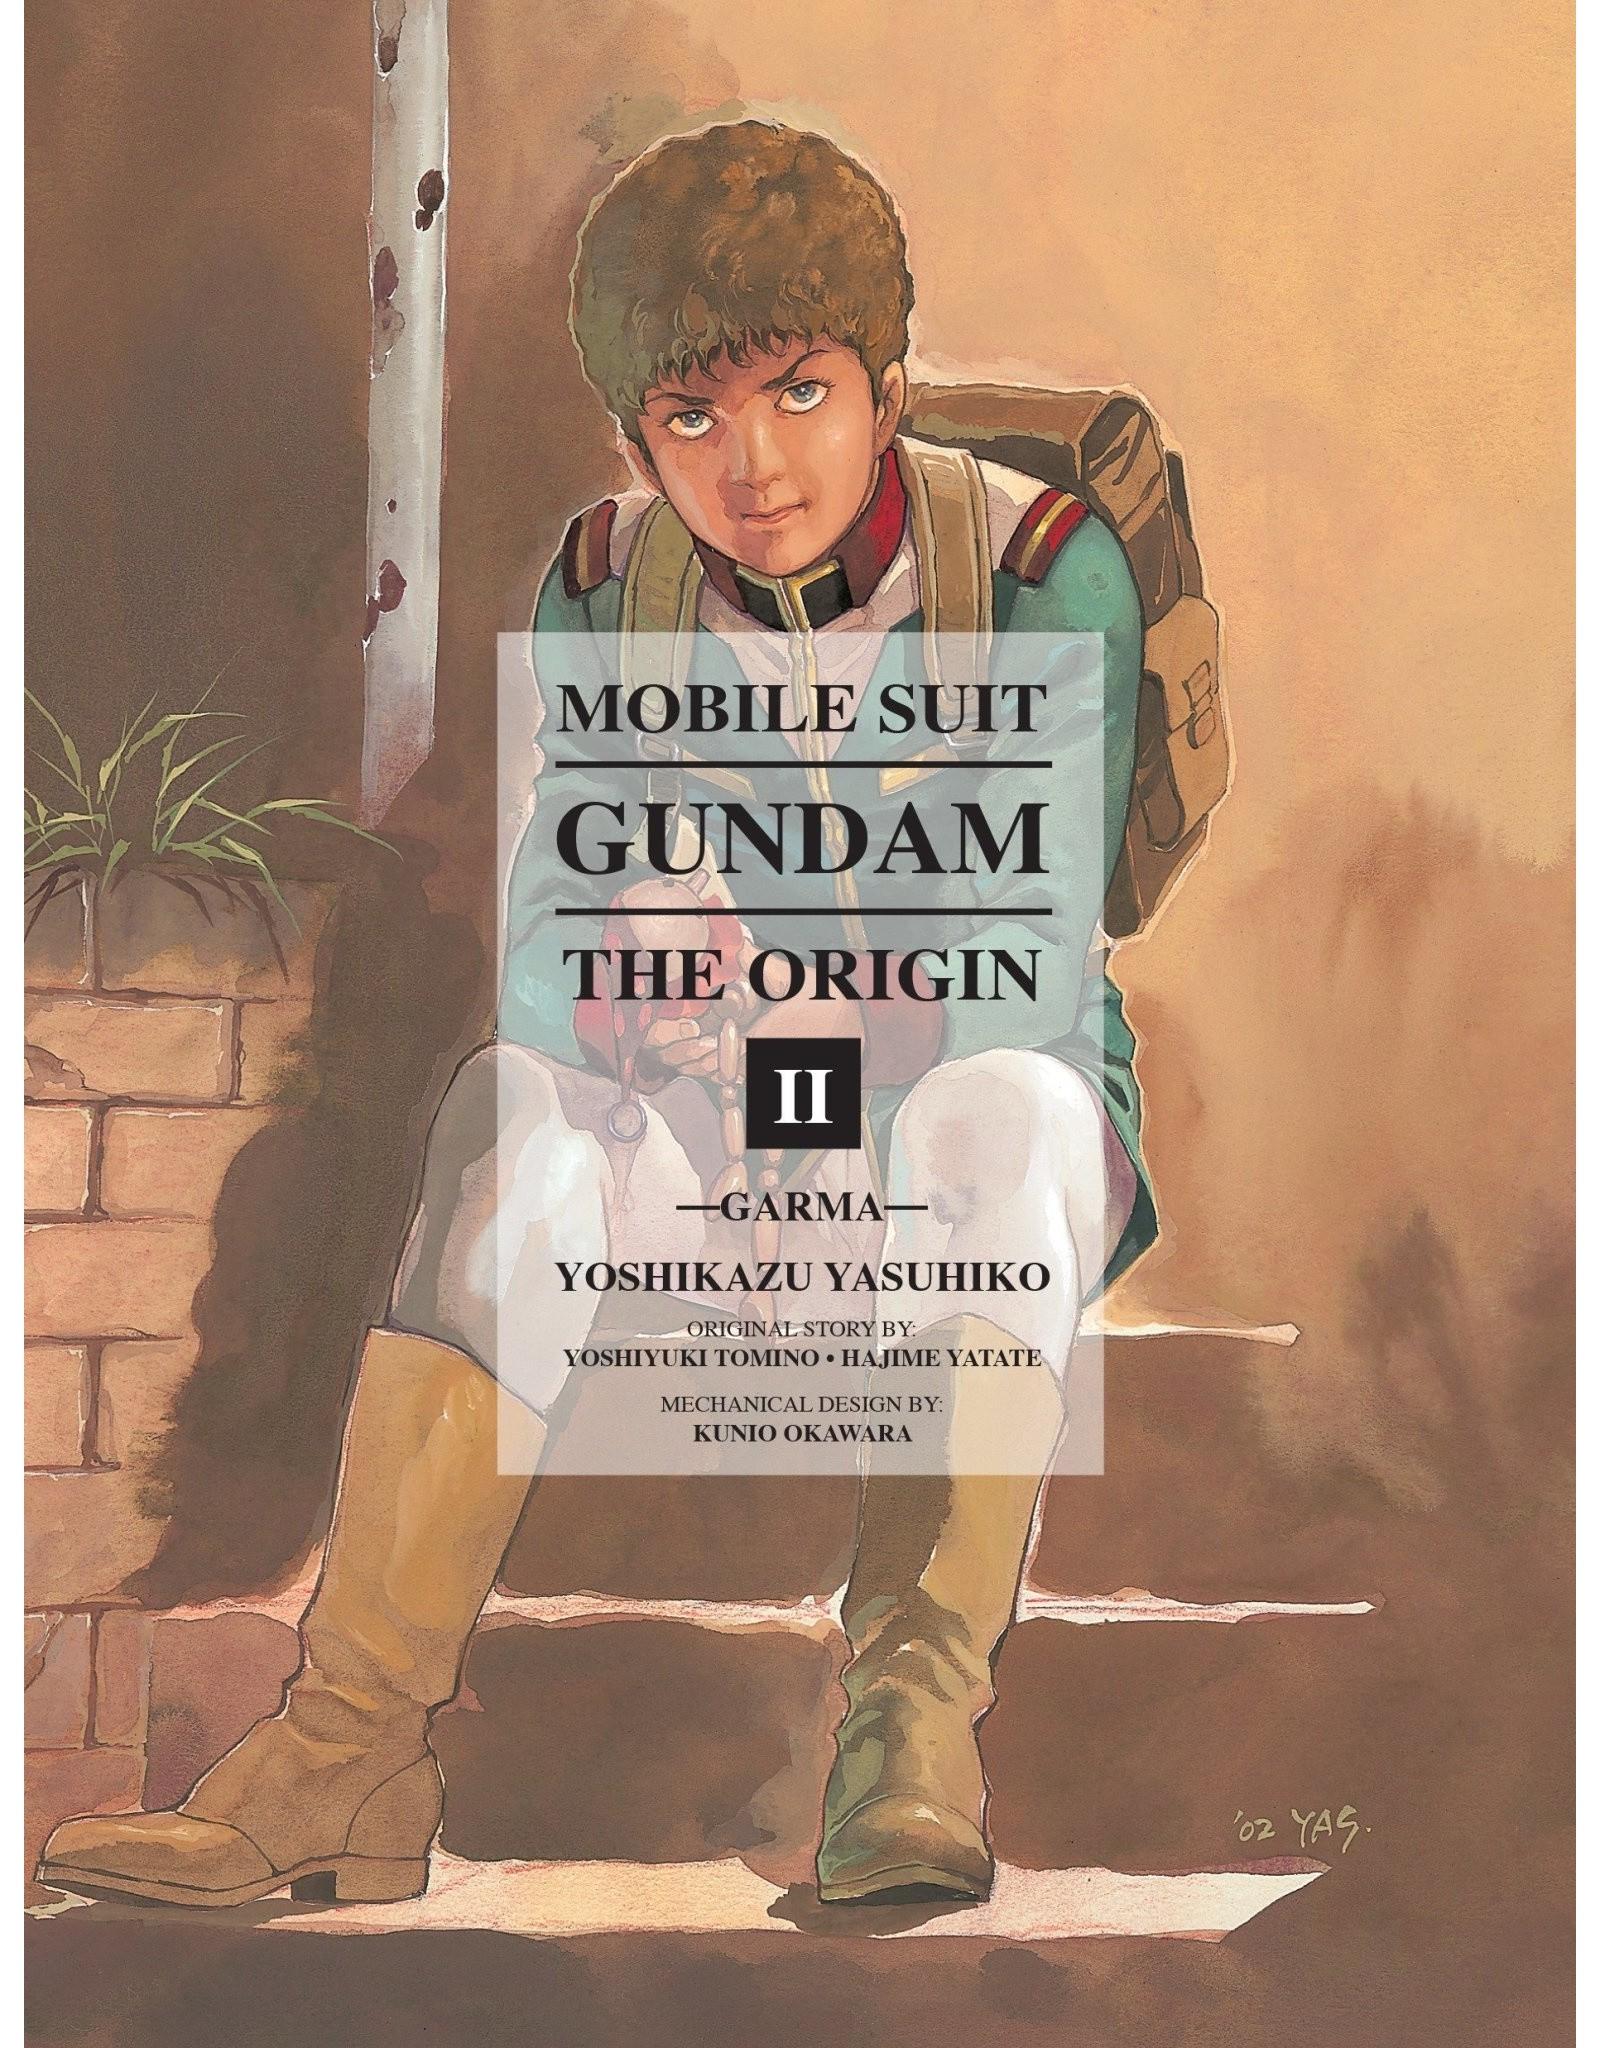 Mobile Suit Gundam: The Origin II (Engelstalig)